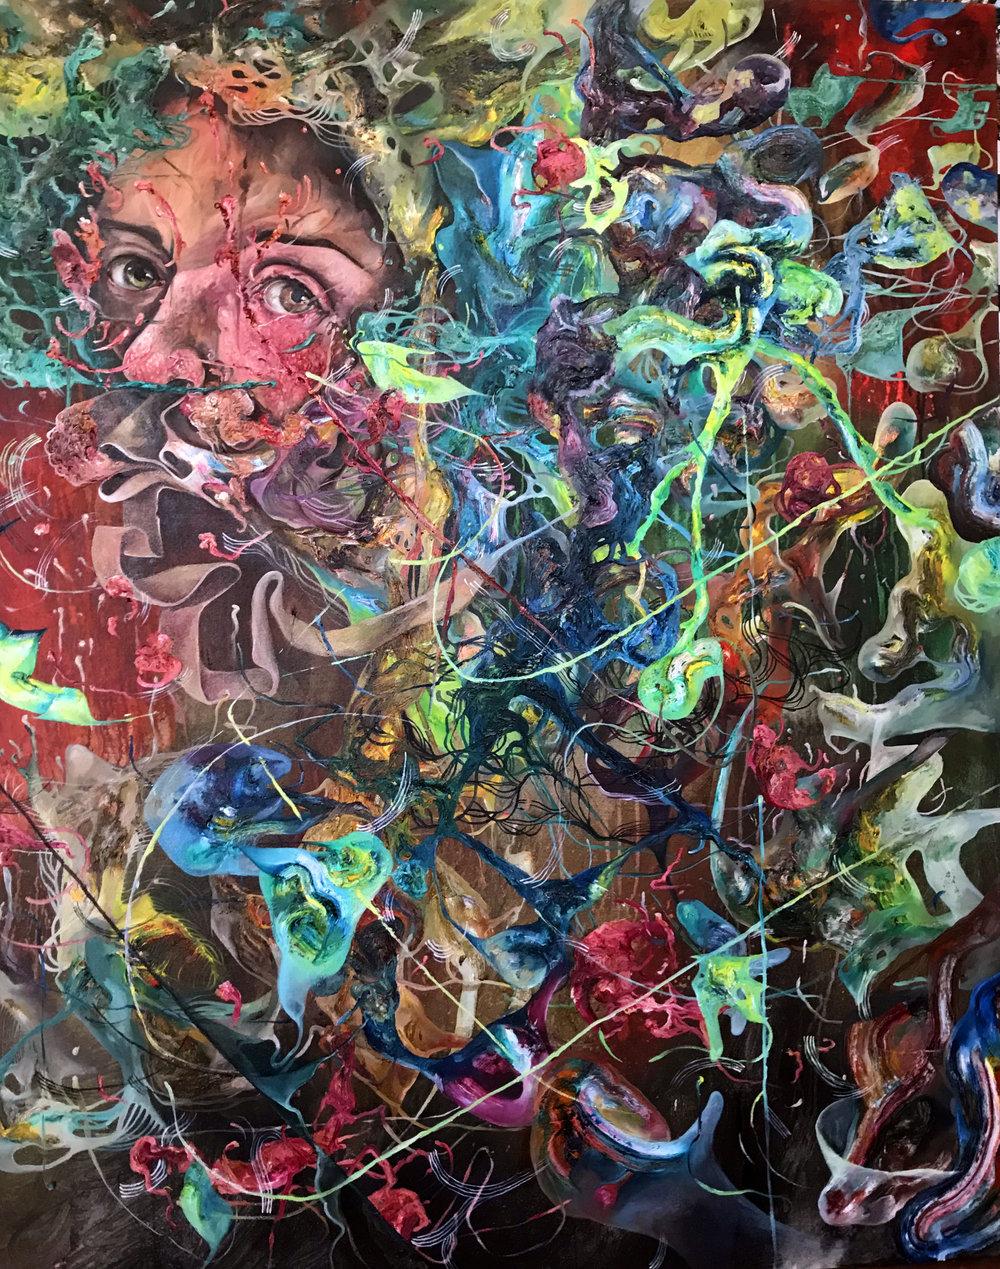 Fragogna_No Armageddon Needed_Oil on Canvas_60 x 48.jpg